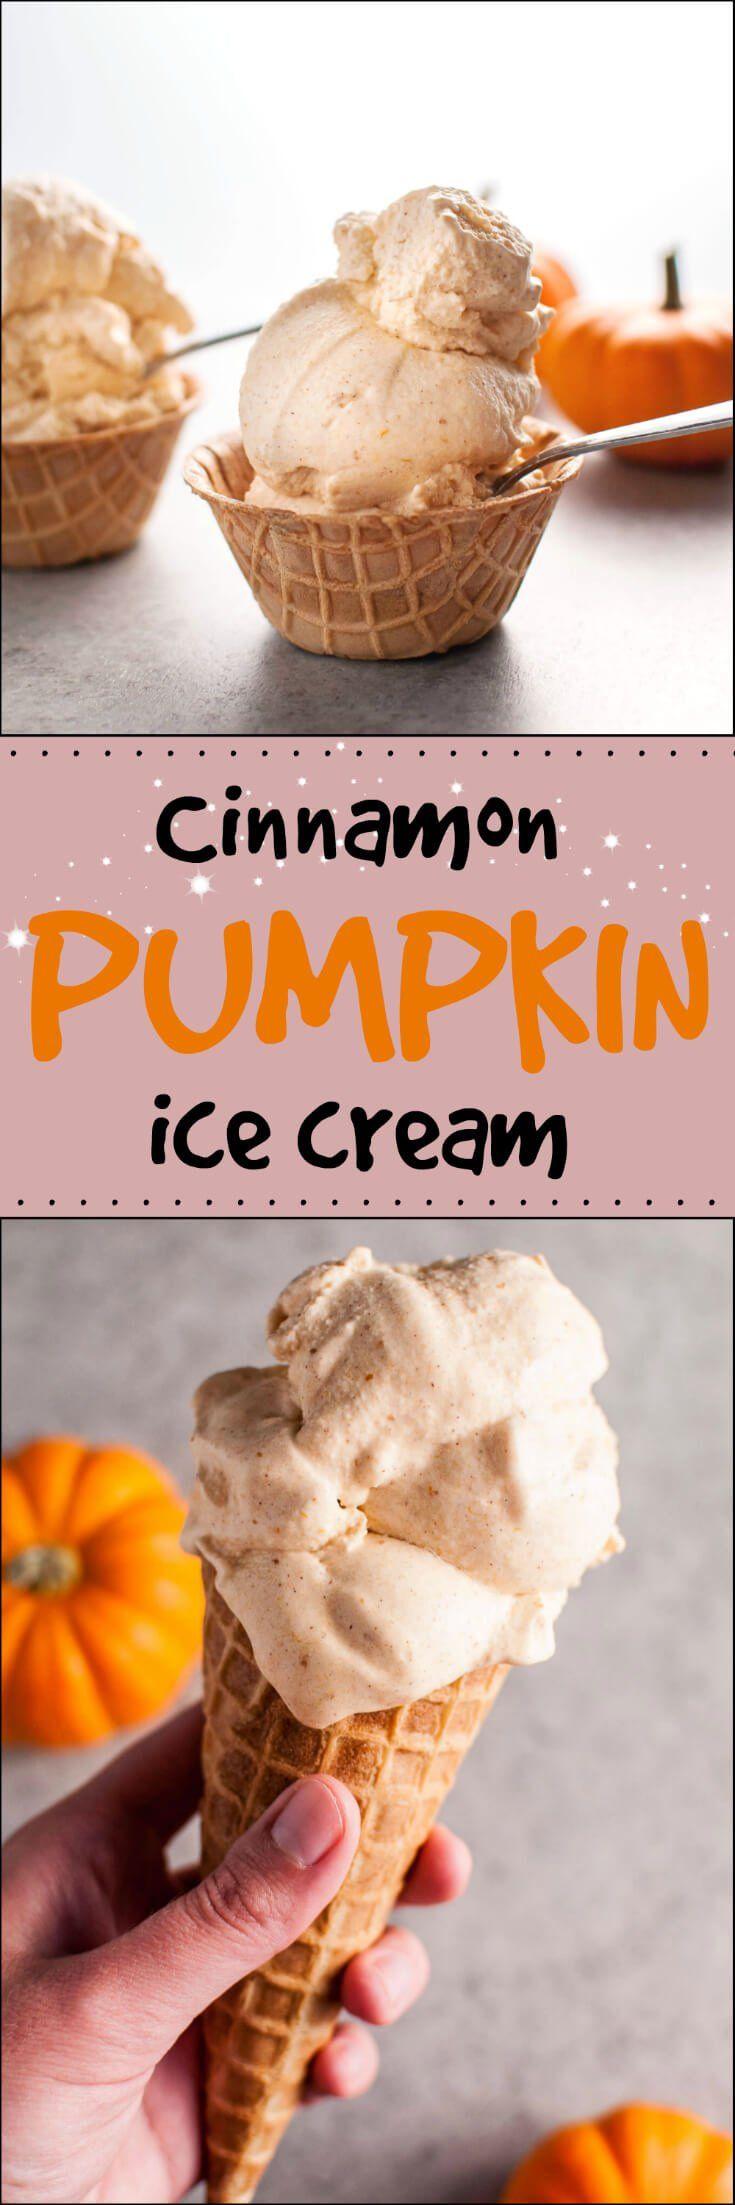 ingredient ice cream maker recipe for cinnamon pumpkin ice cream ...